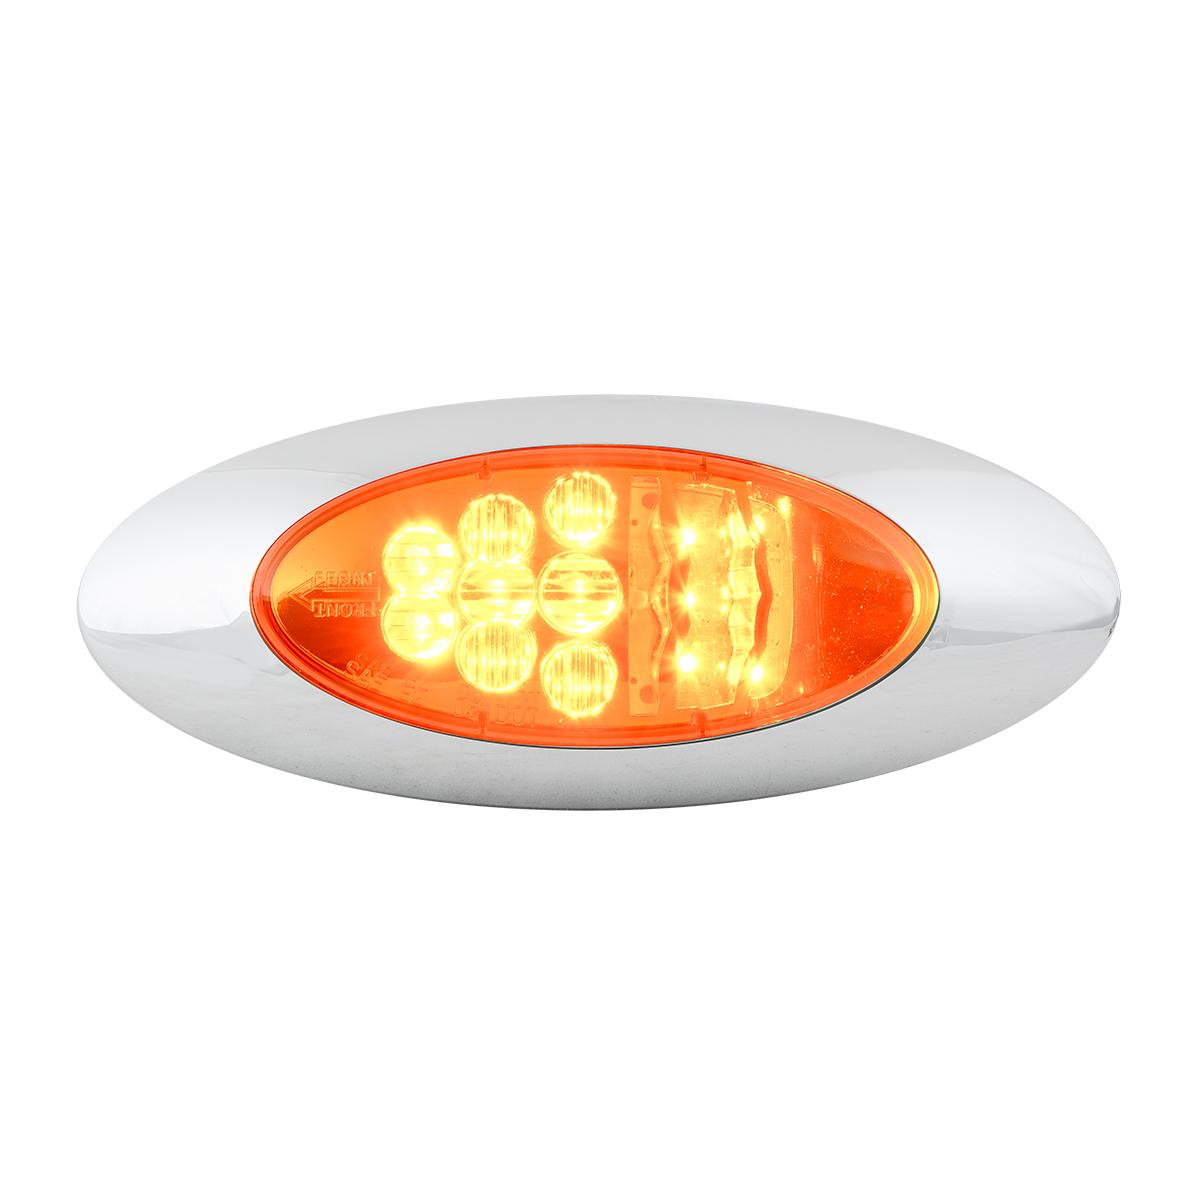 77270 Y2K LED Turn/Marker Light with Chrome Bezel in Amber/Amber